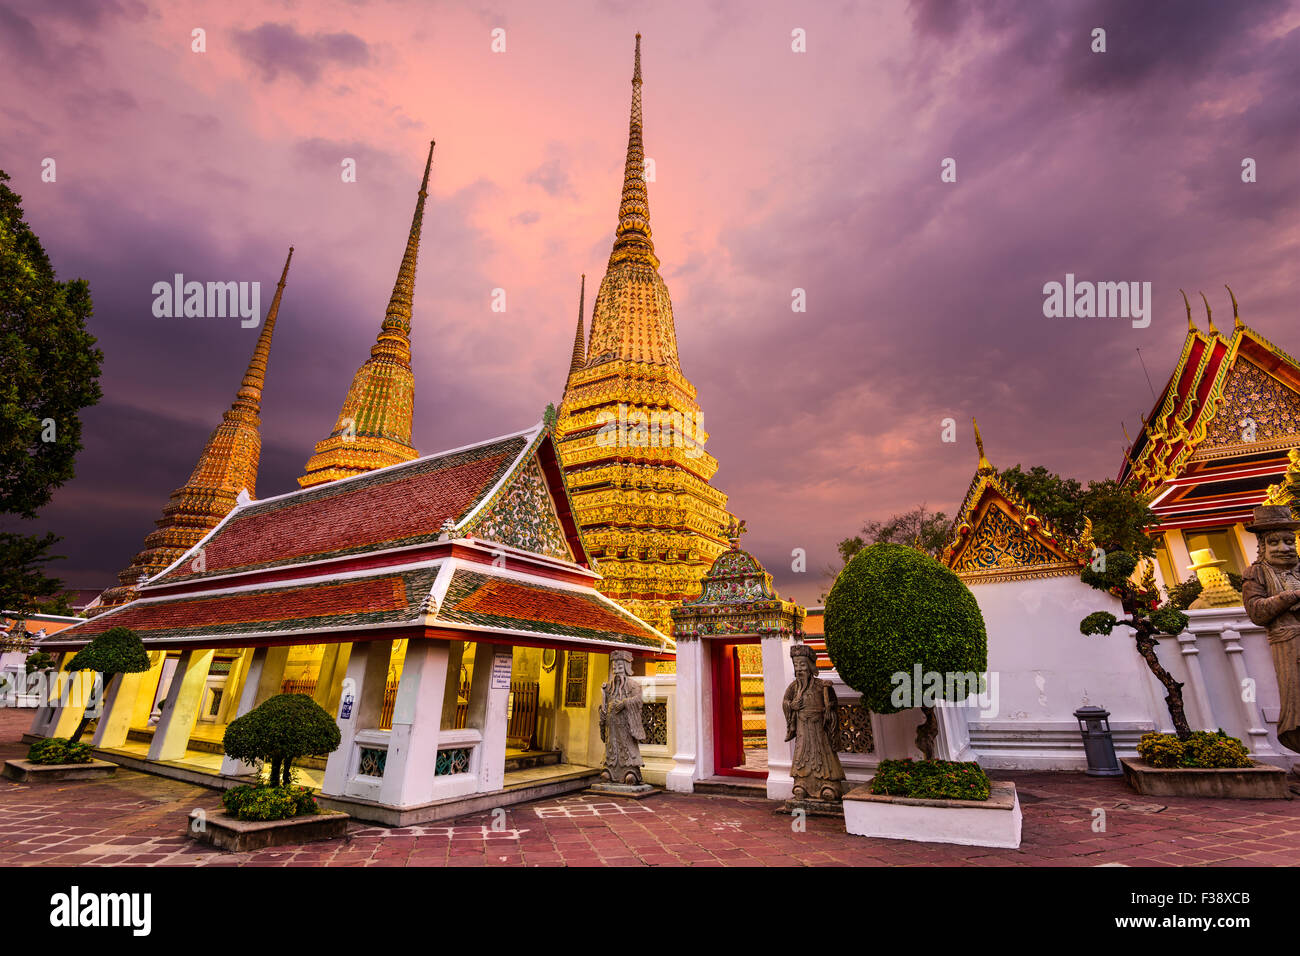 Wat Pho Temple in Bangkok, Thailand. - Stock Image